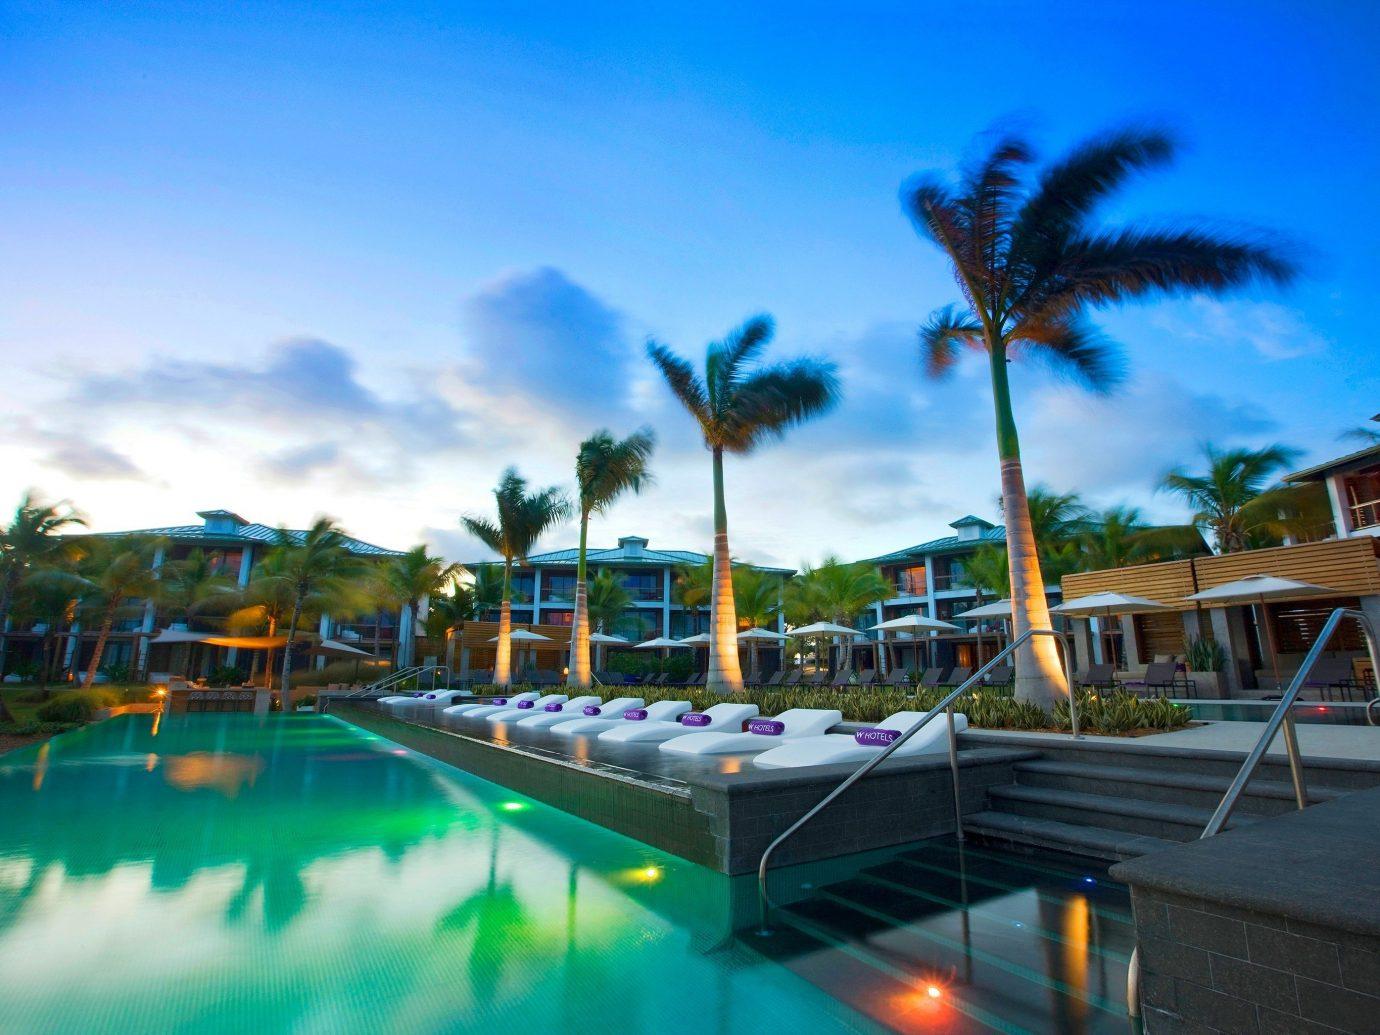 Hotels sky outdoor leisure swimming pool Resort palm vacation Water park marina amusement park estate Beach condominium dock park colorful lined